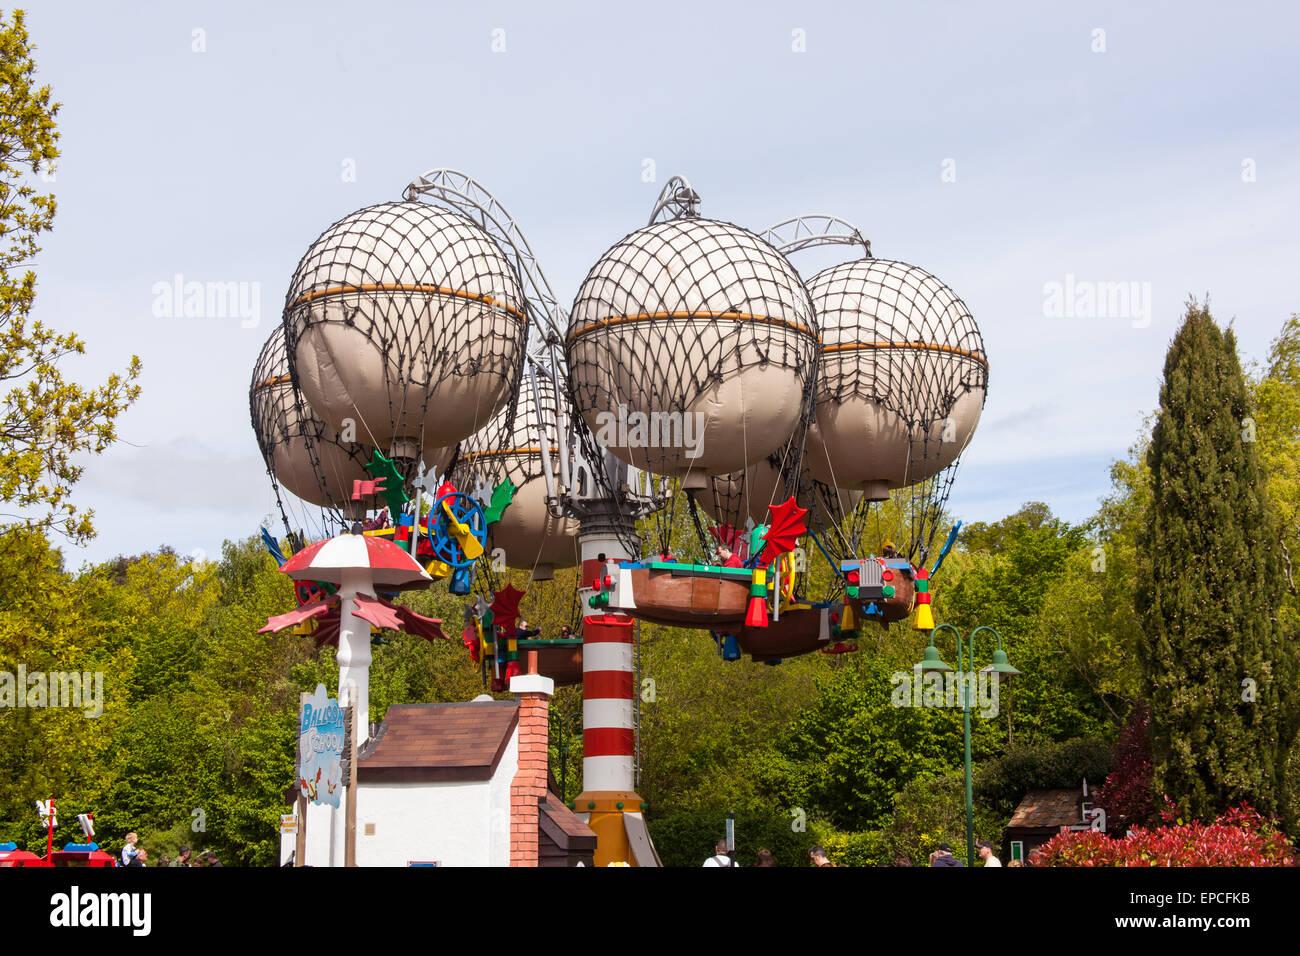 Balloon Rides Stock Photos Balloon Rides Stock Images Alamy